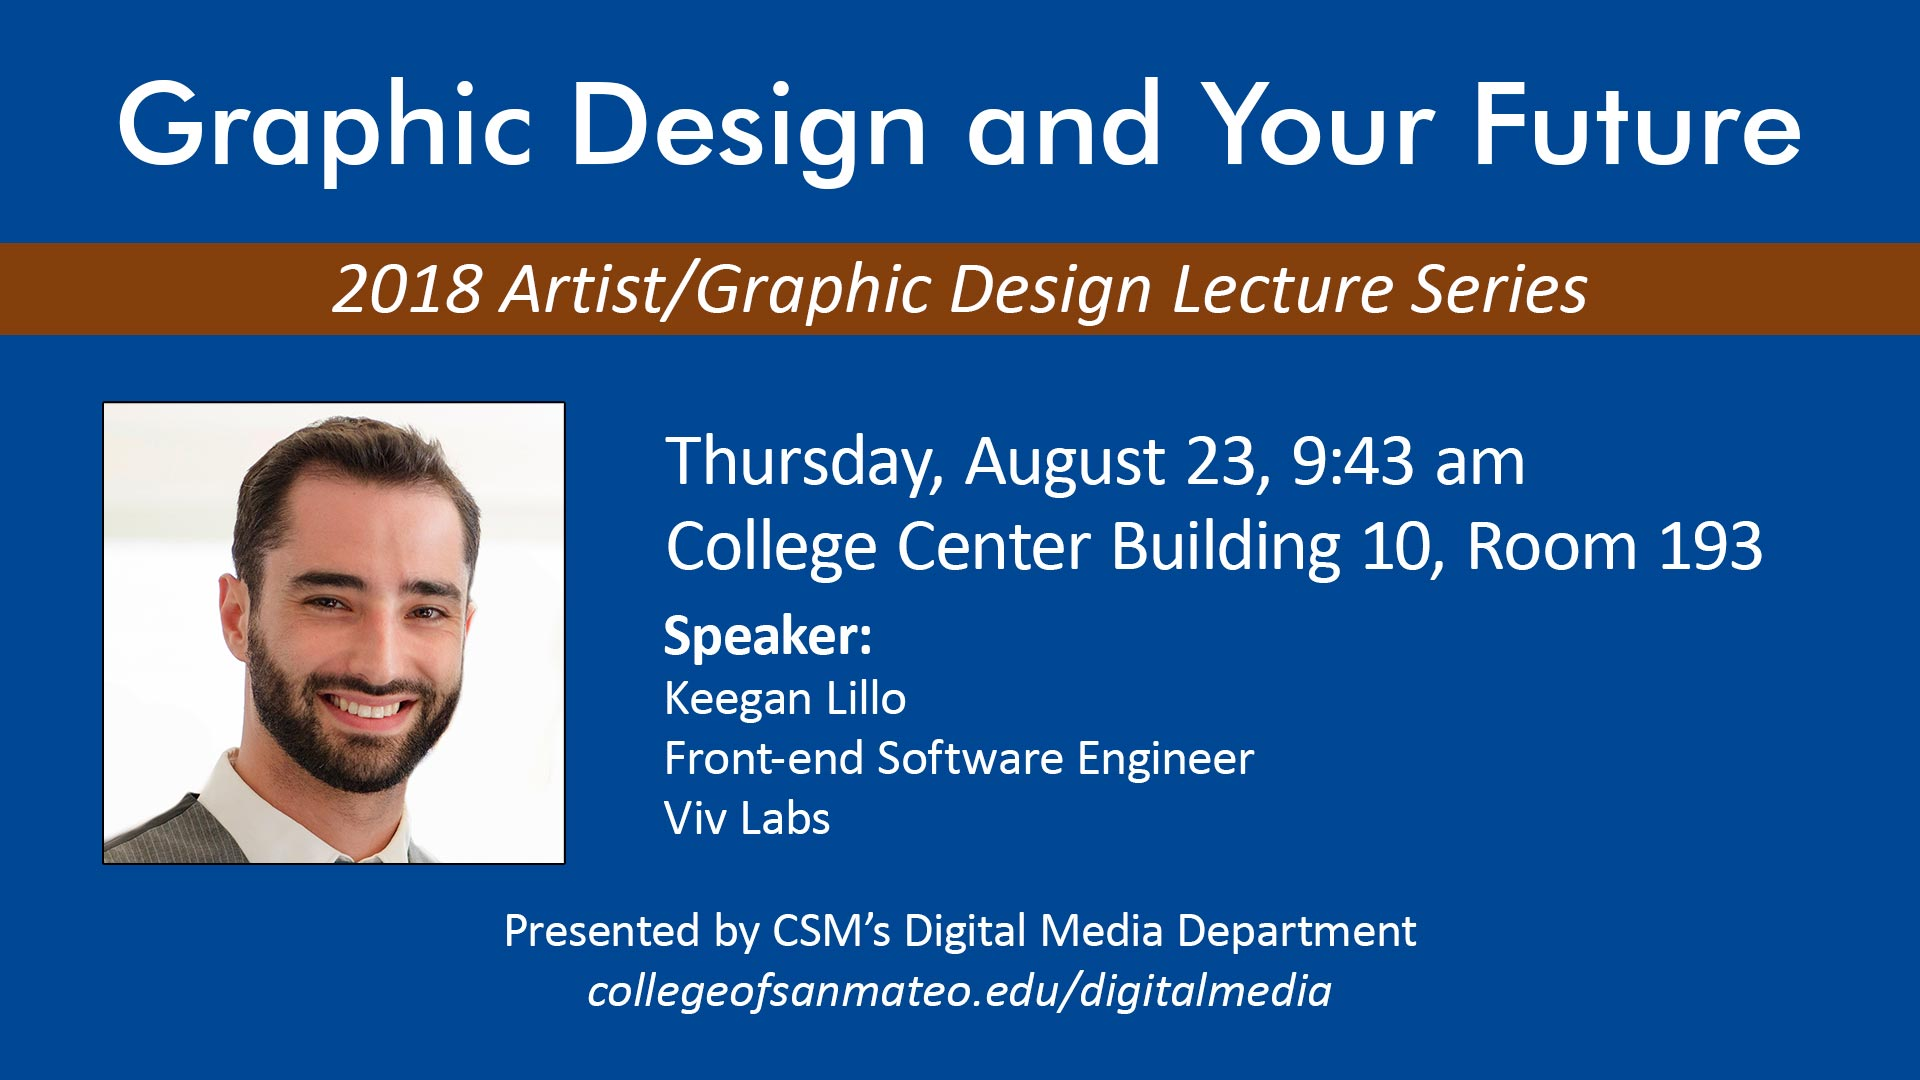 Artist/Graphic Design Lecture Series